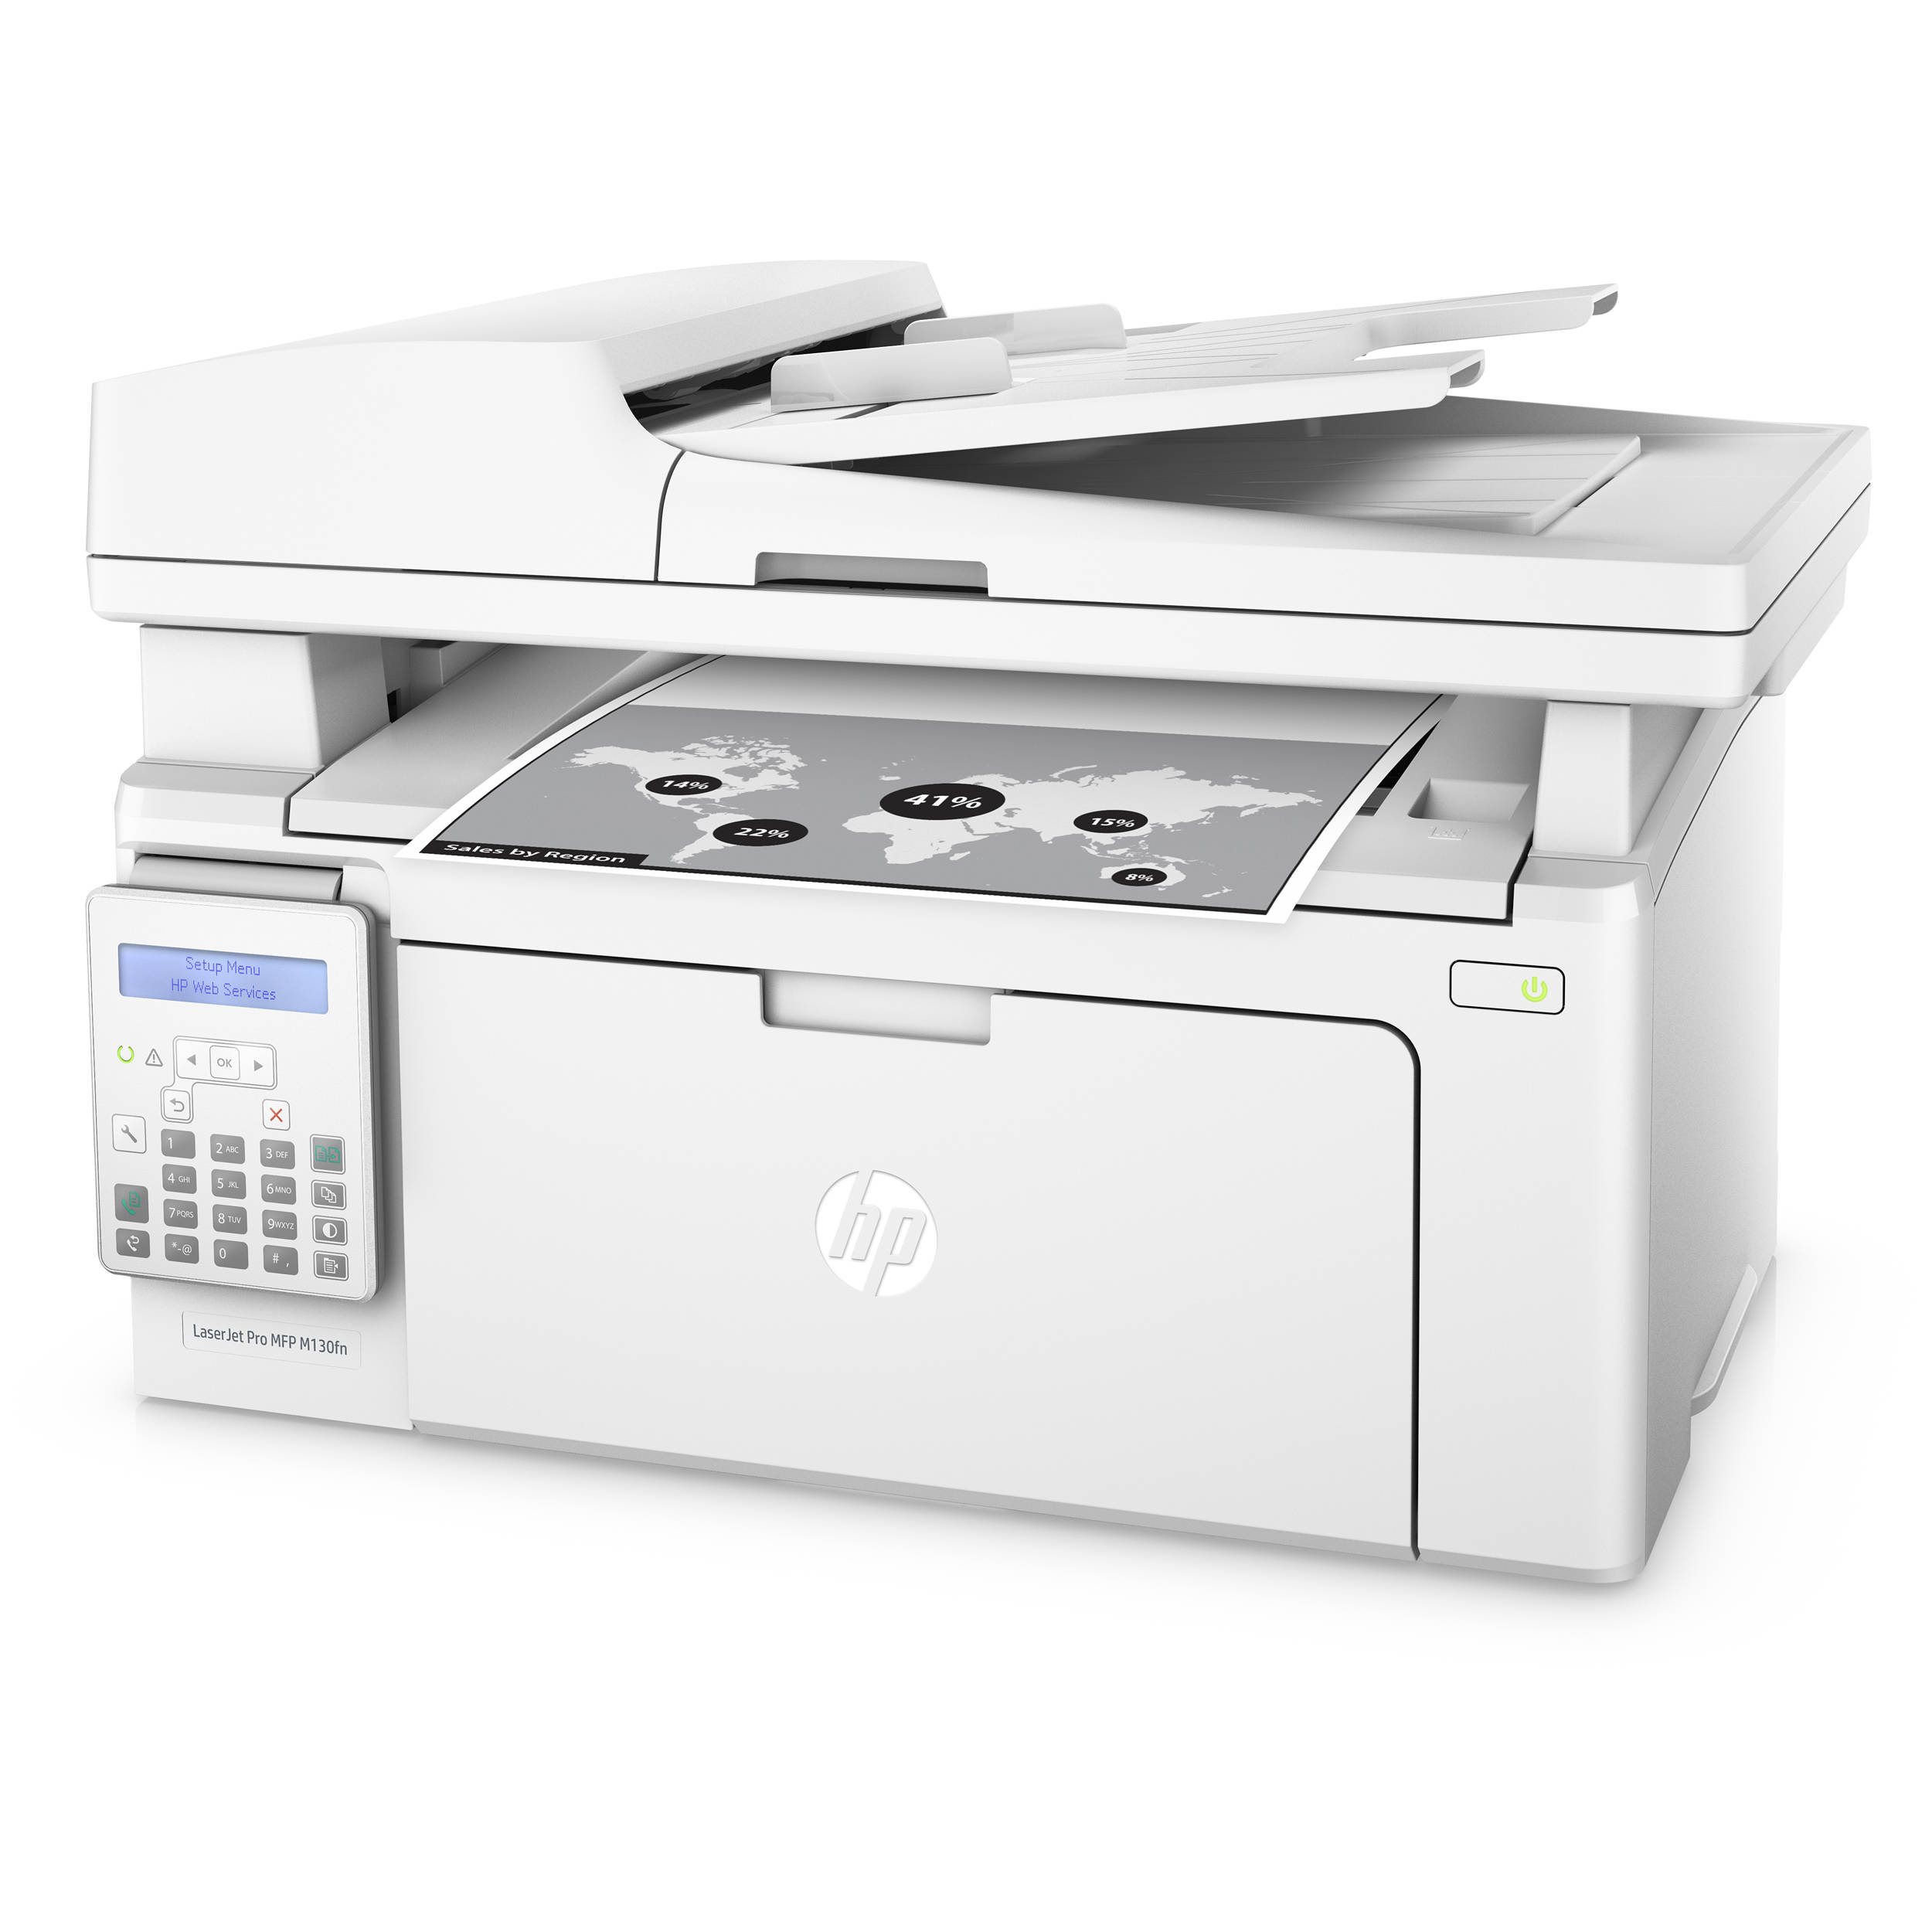 HP LaserJet Pro M130fn All-in-One Monochrome Laser Printer